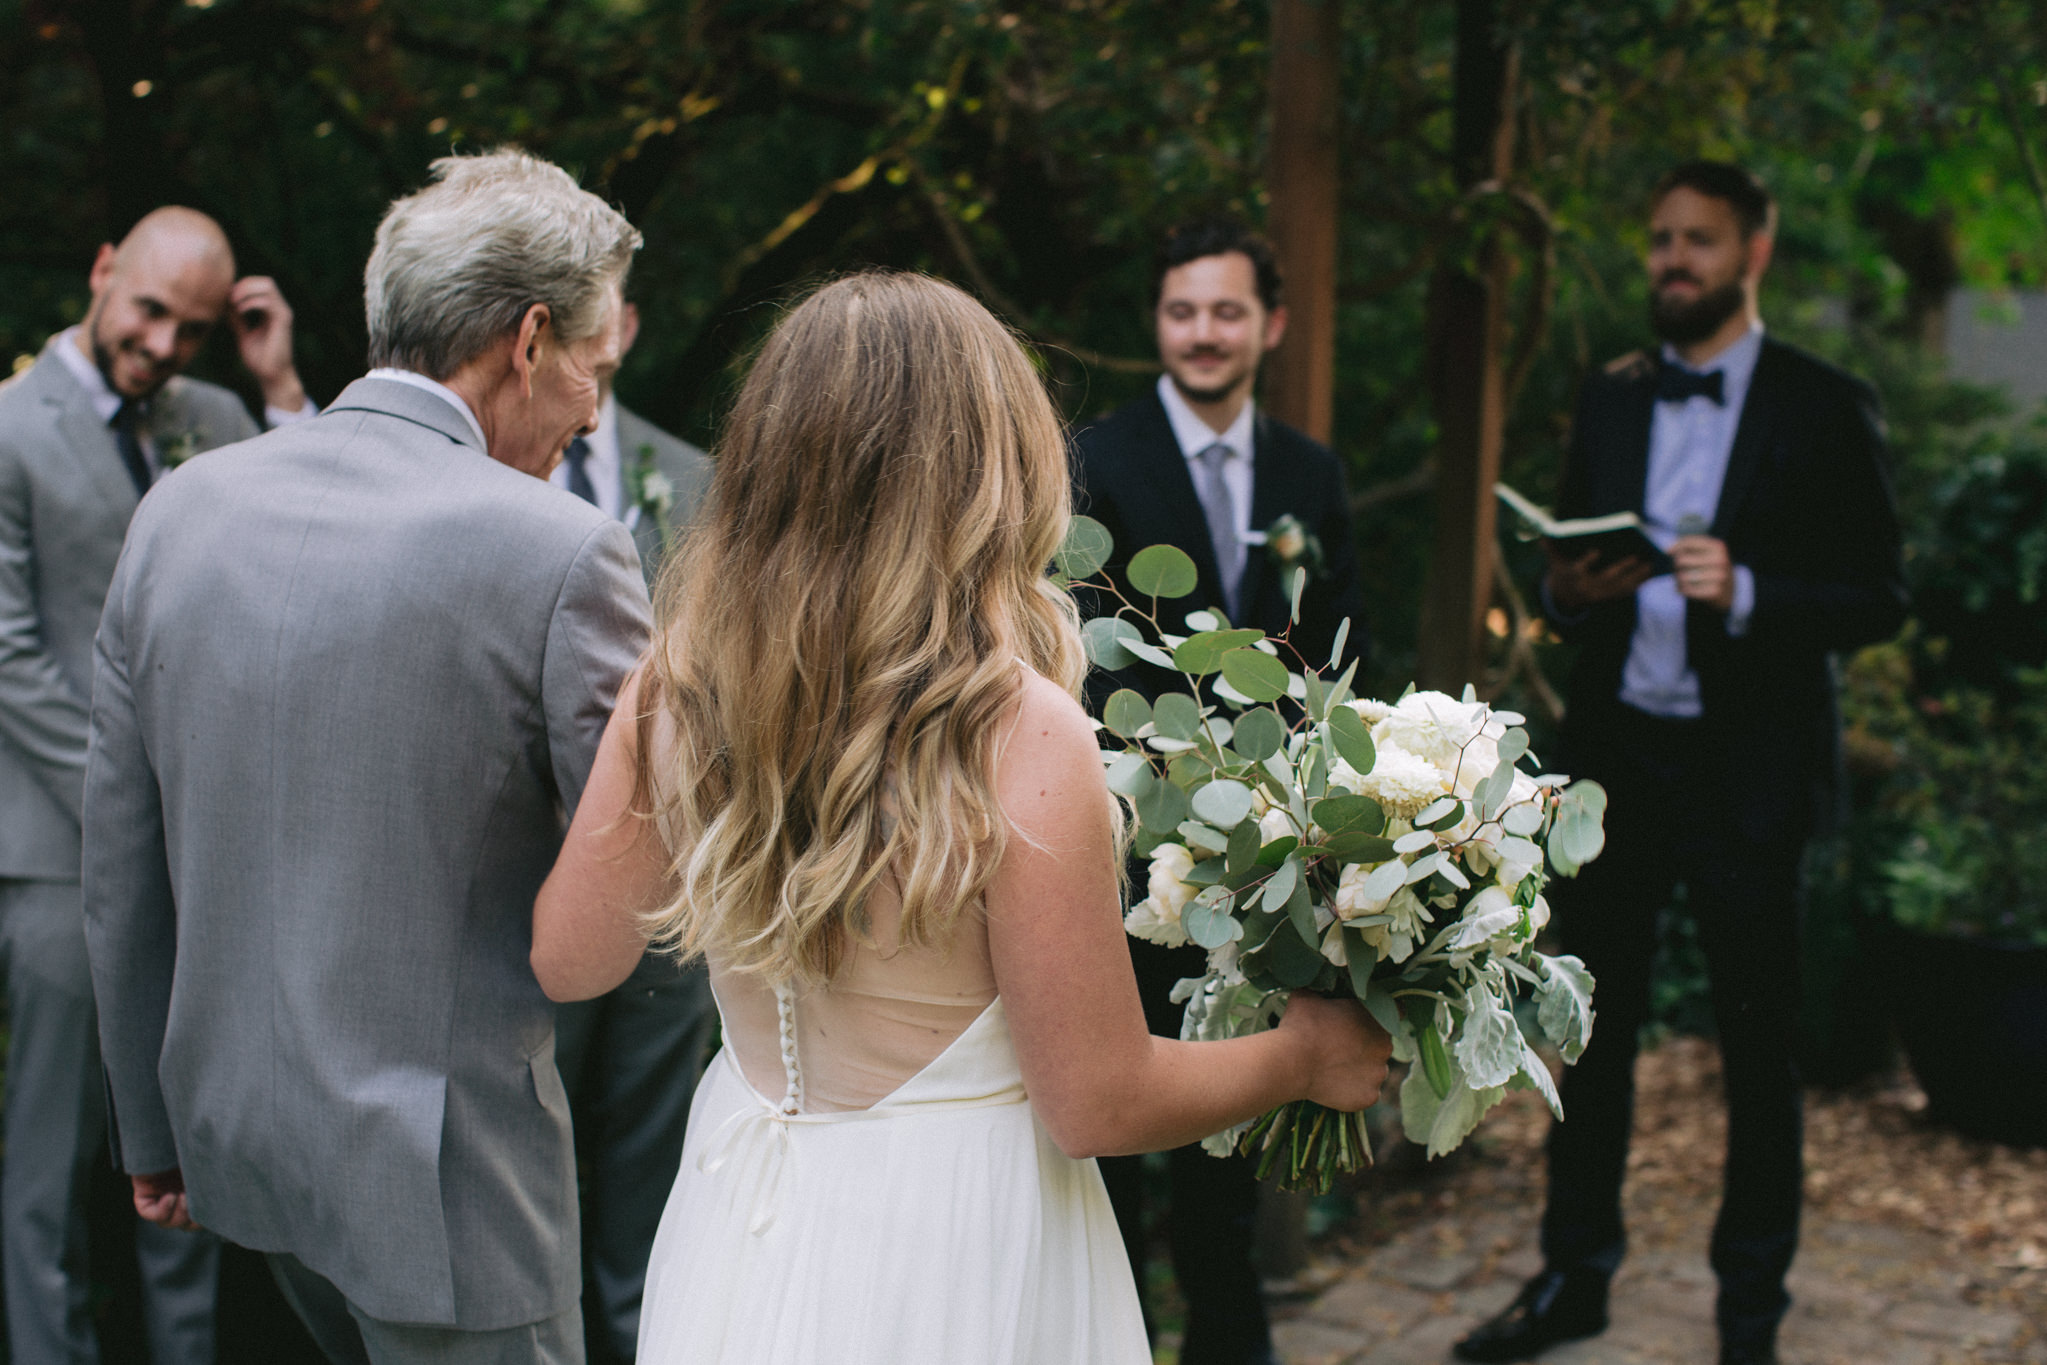 Backyard-Bainbridge-Island-Wedding-Alycia-Lovell-Photography-89.JPG